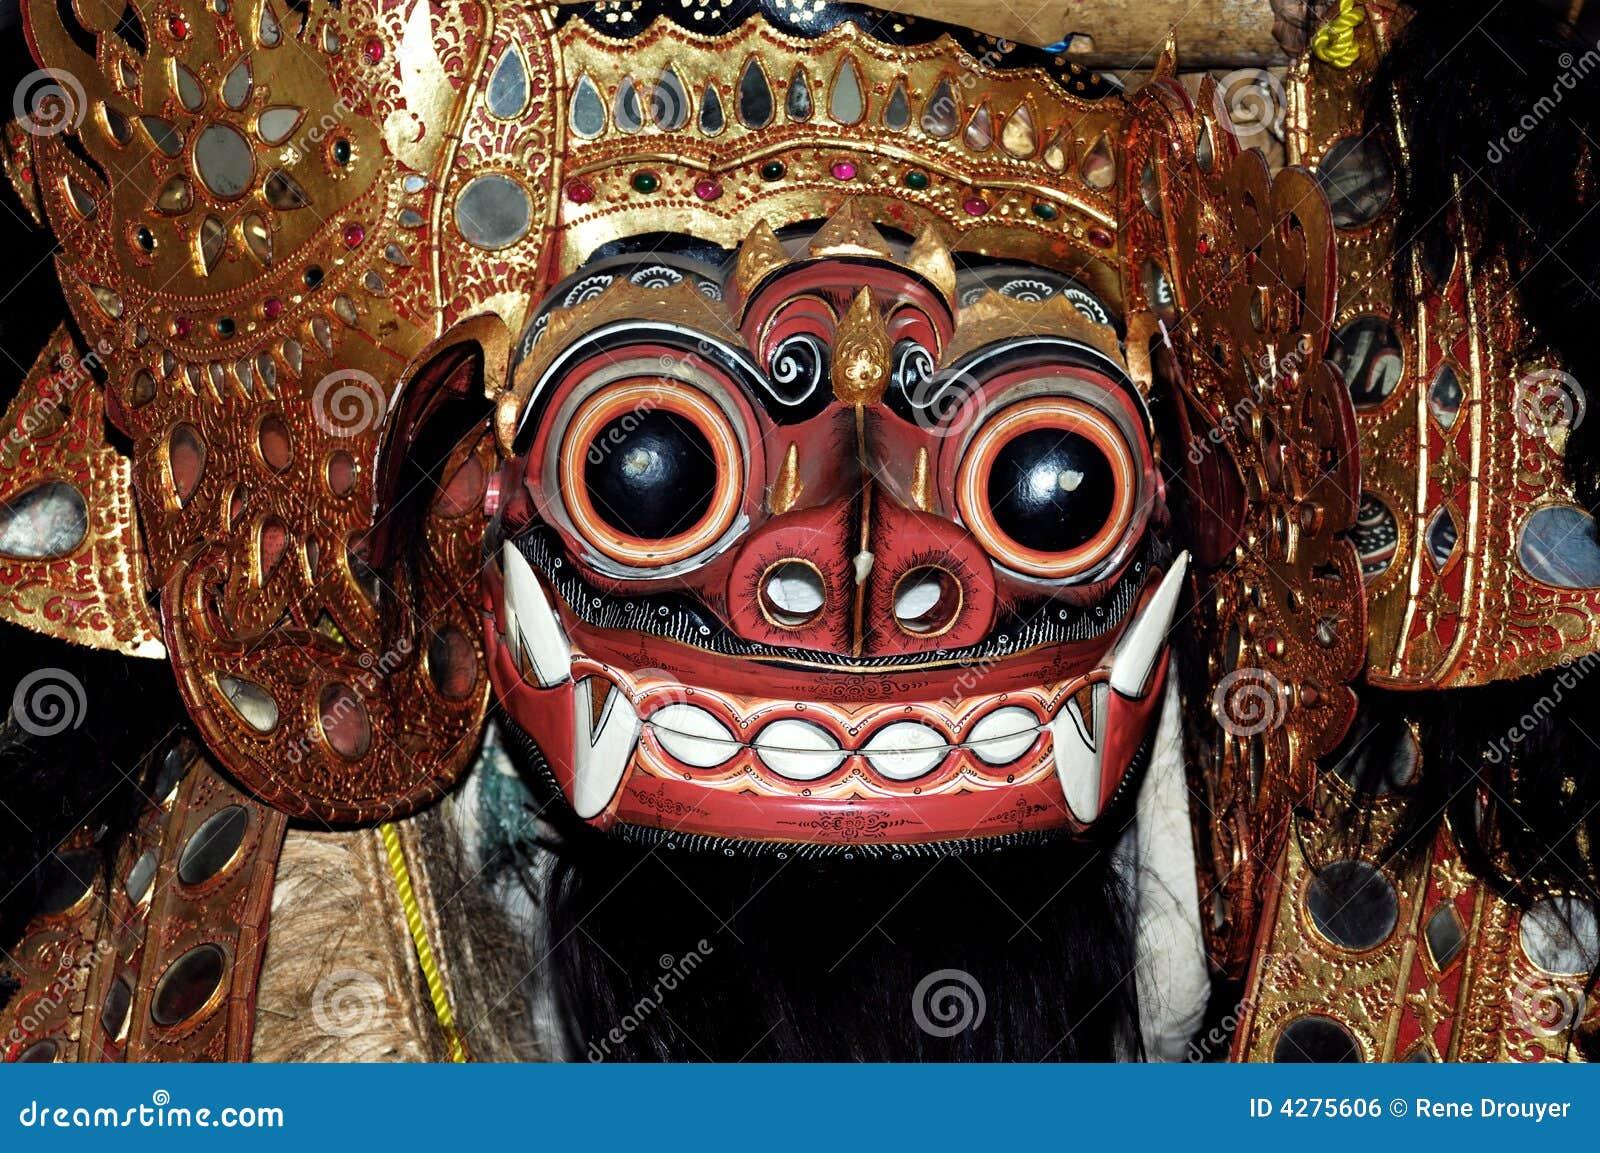 indonesia  java  bali  mask royalty free stock image